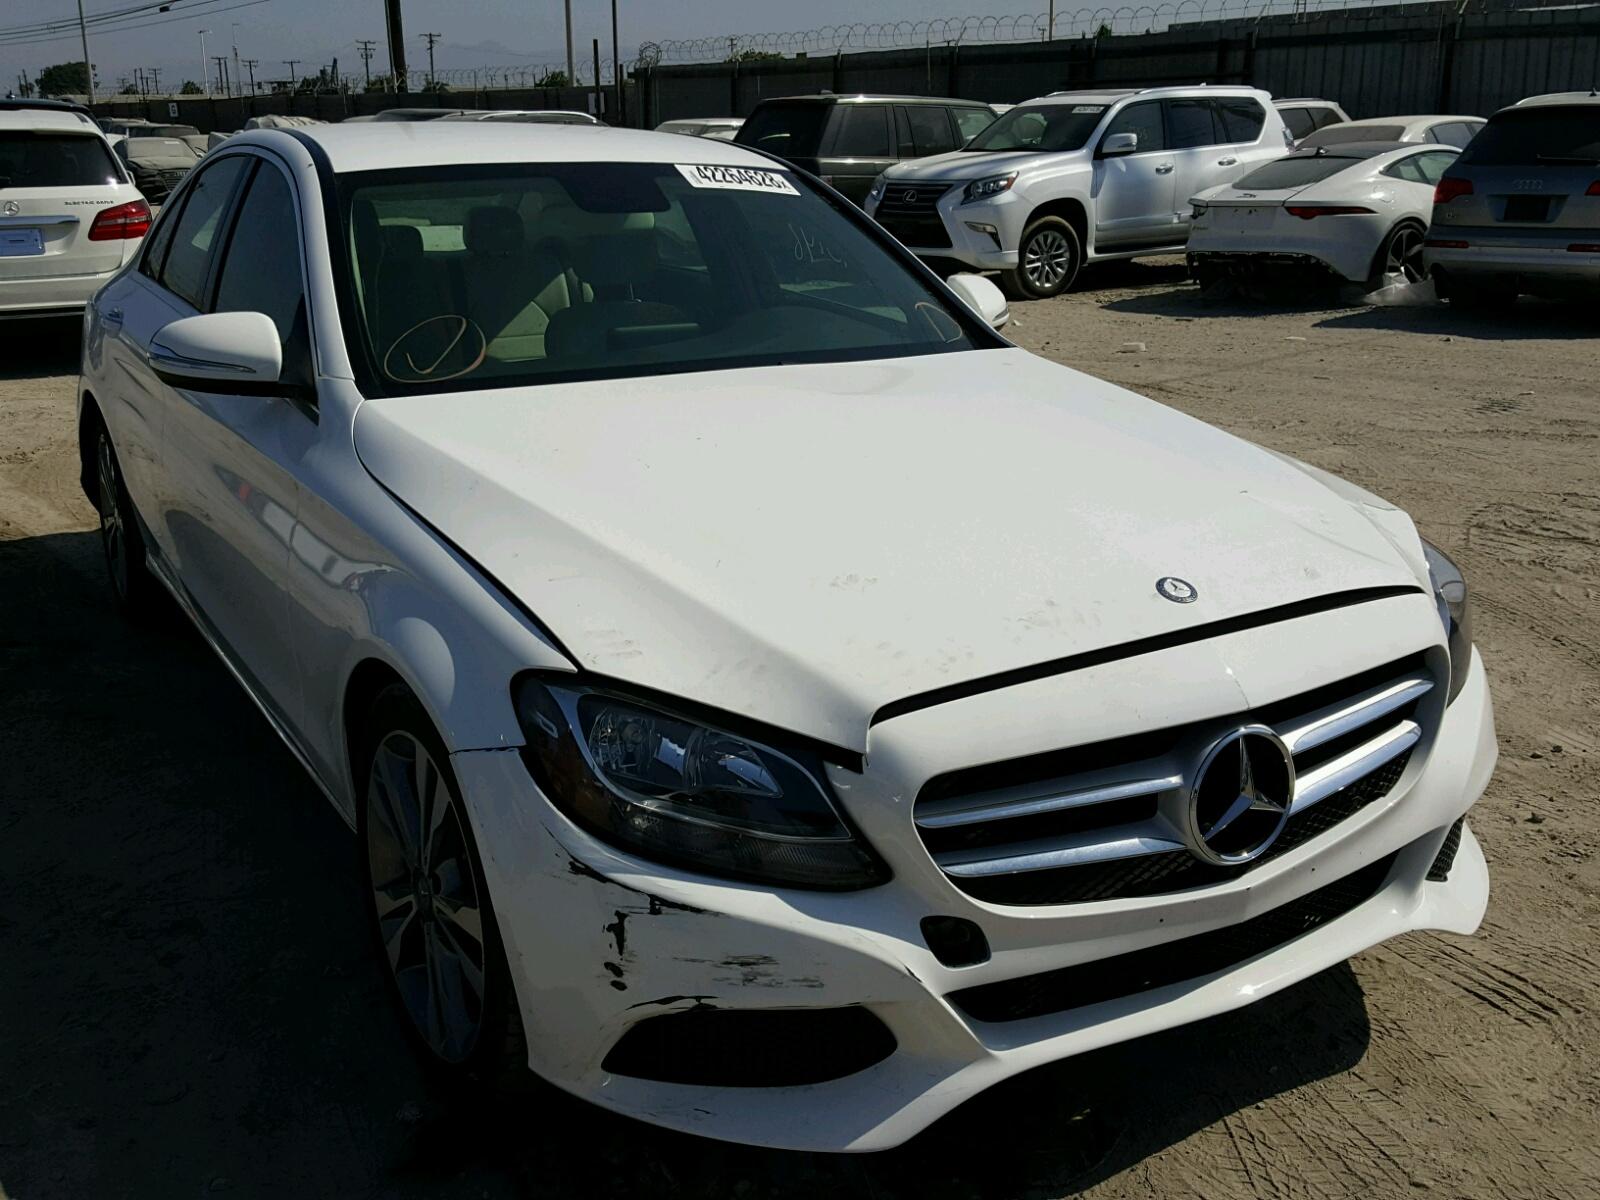 2015 Mercedes Benz C300 в продаже Экономия на авто и боРее